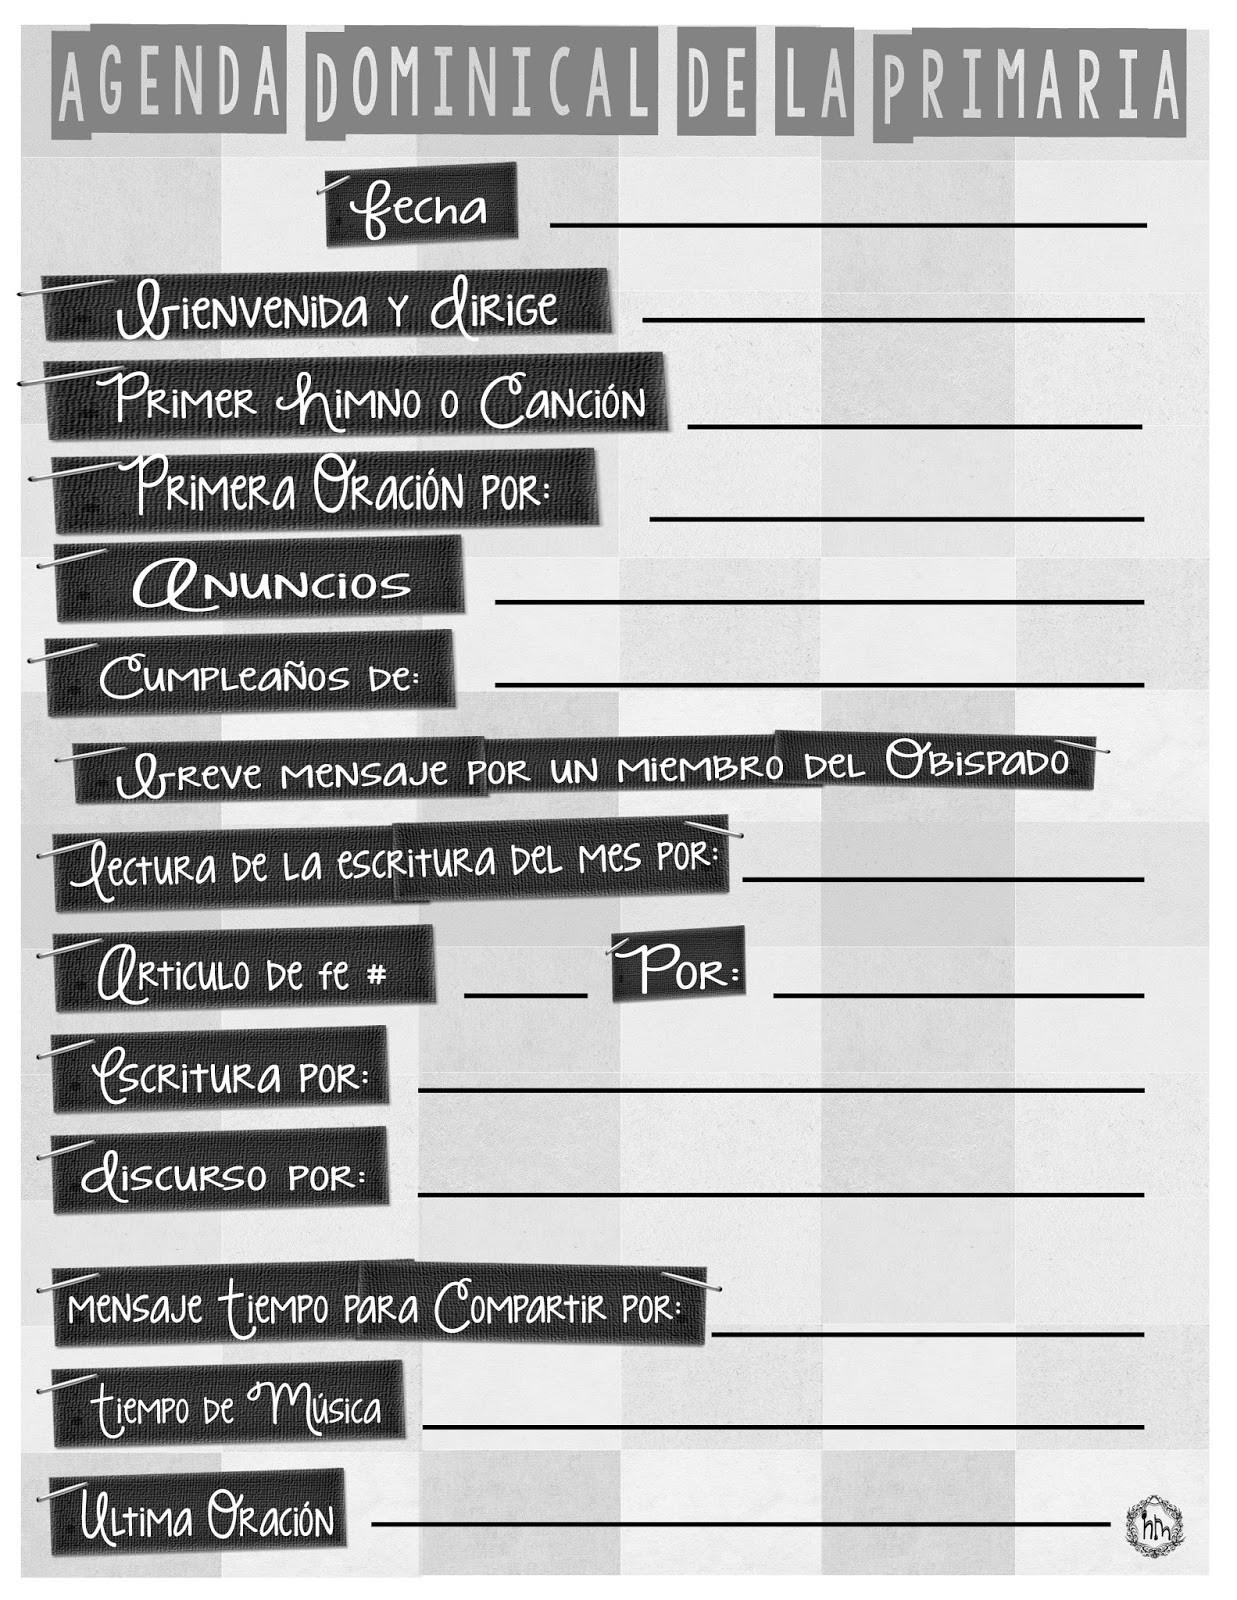 Calendario Para Imprimir 2019 Blanco Y Negro Recientes Holamormon3 Primaria Lds Sud 2018